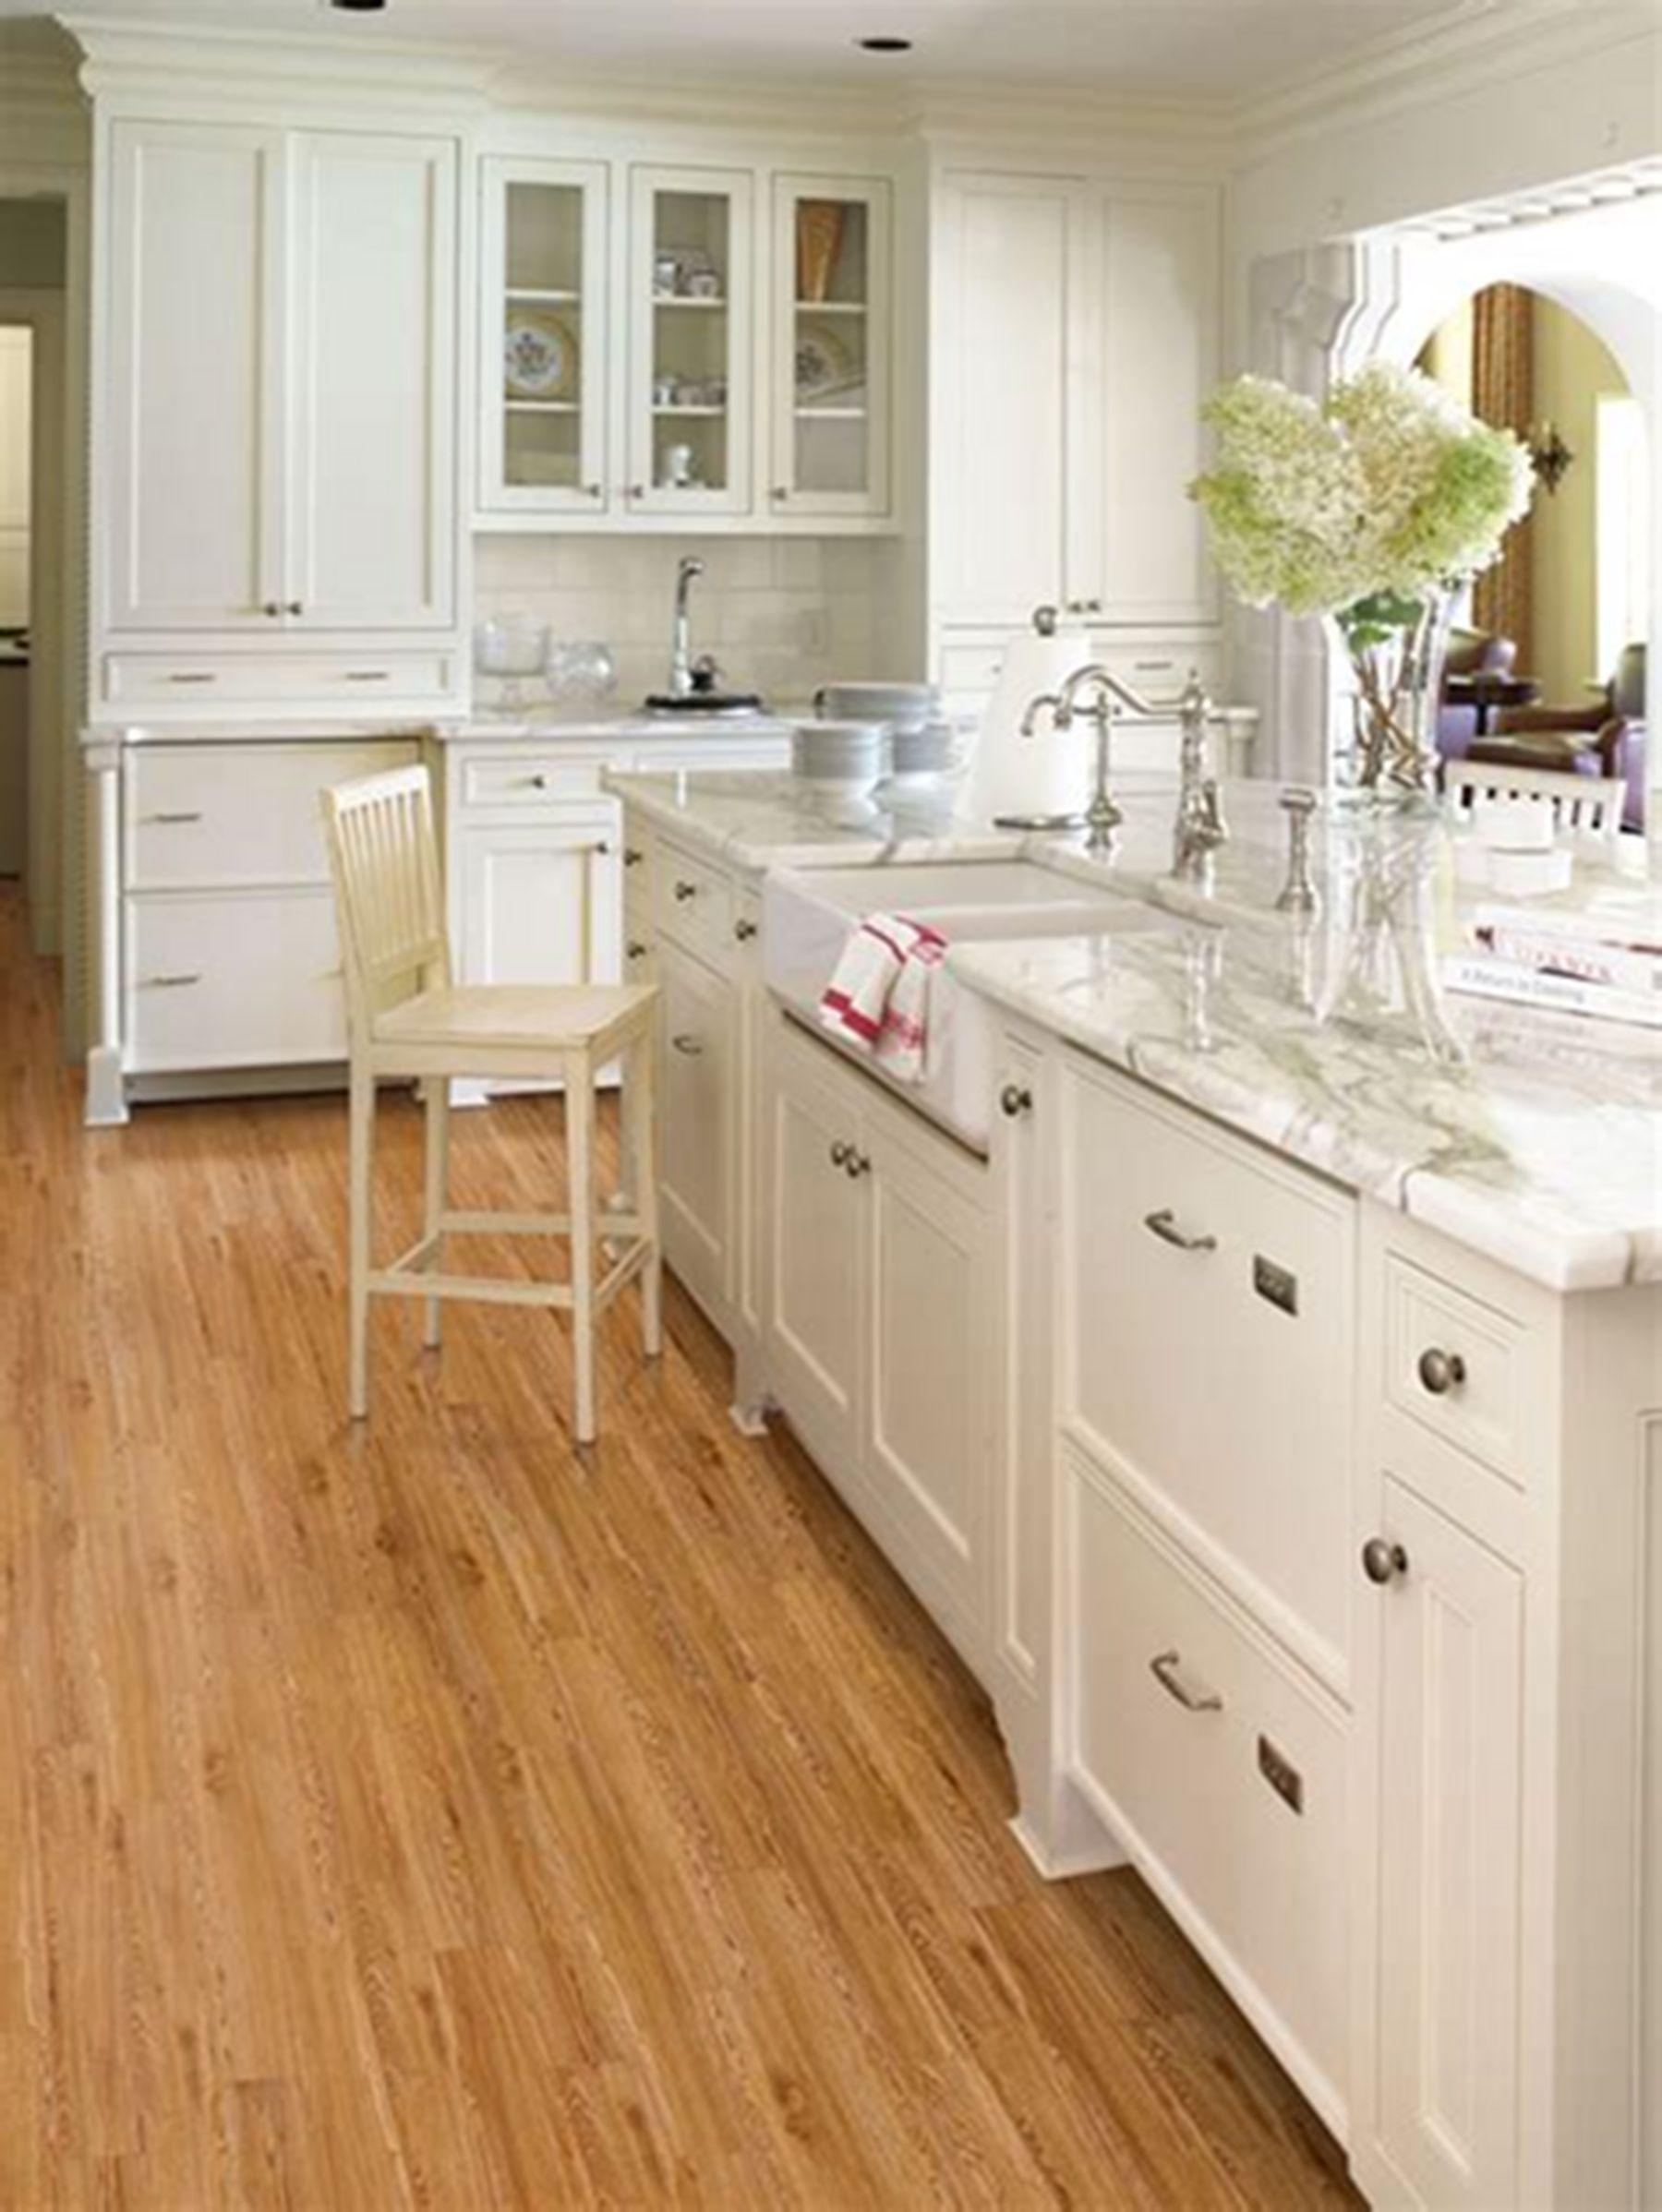 10 Amazing Kitchen Designs To Inspire Your Comfortable Kitchen White Wood Kitchens Kitchen Flooring White Kitchen Lighting